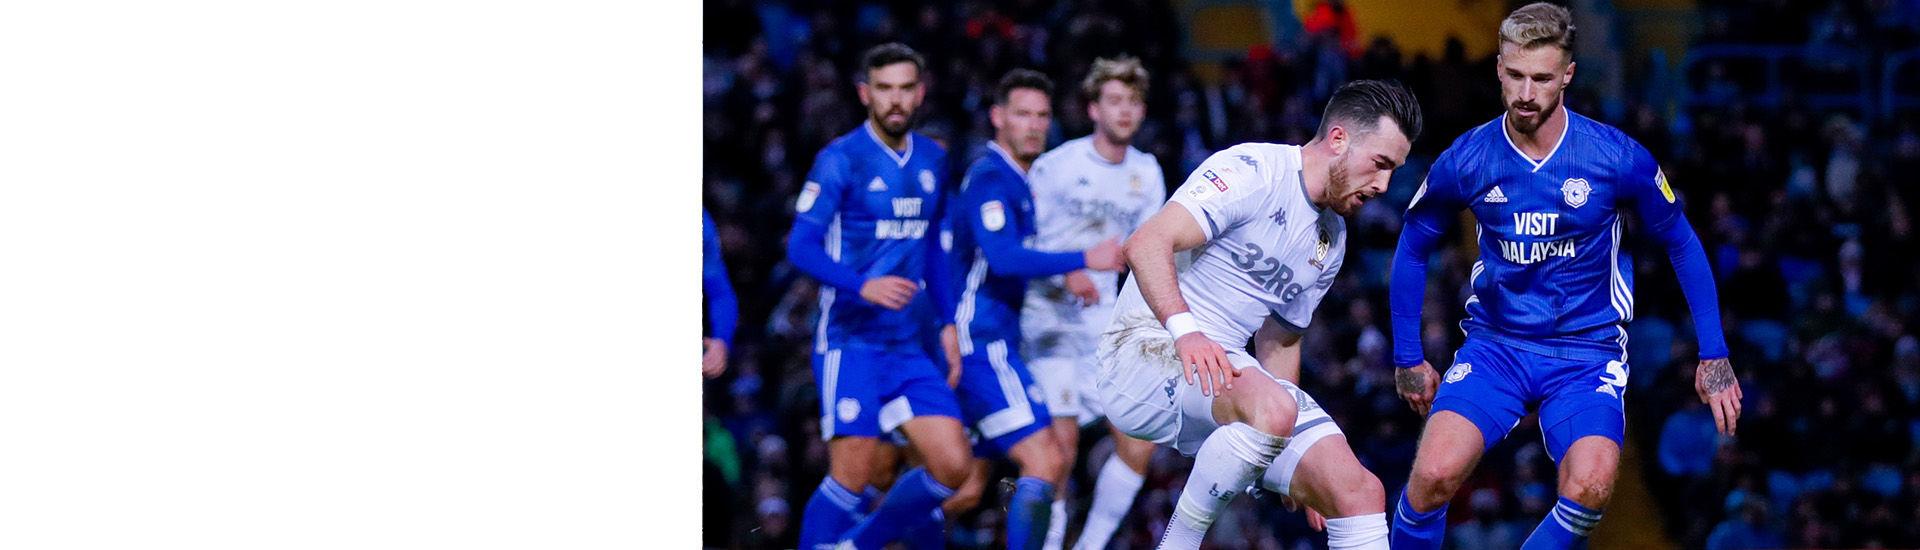 The Final Nine Opponents Leeds United